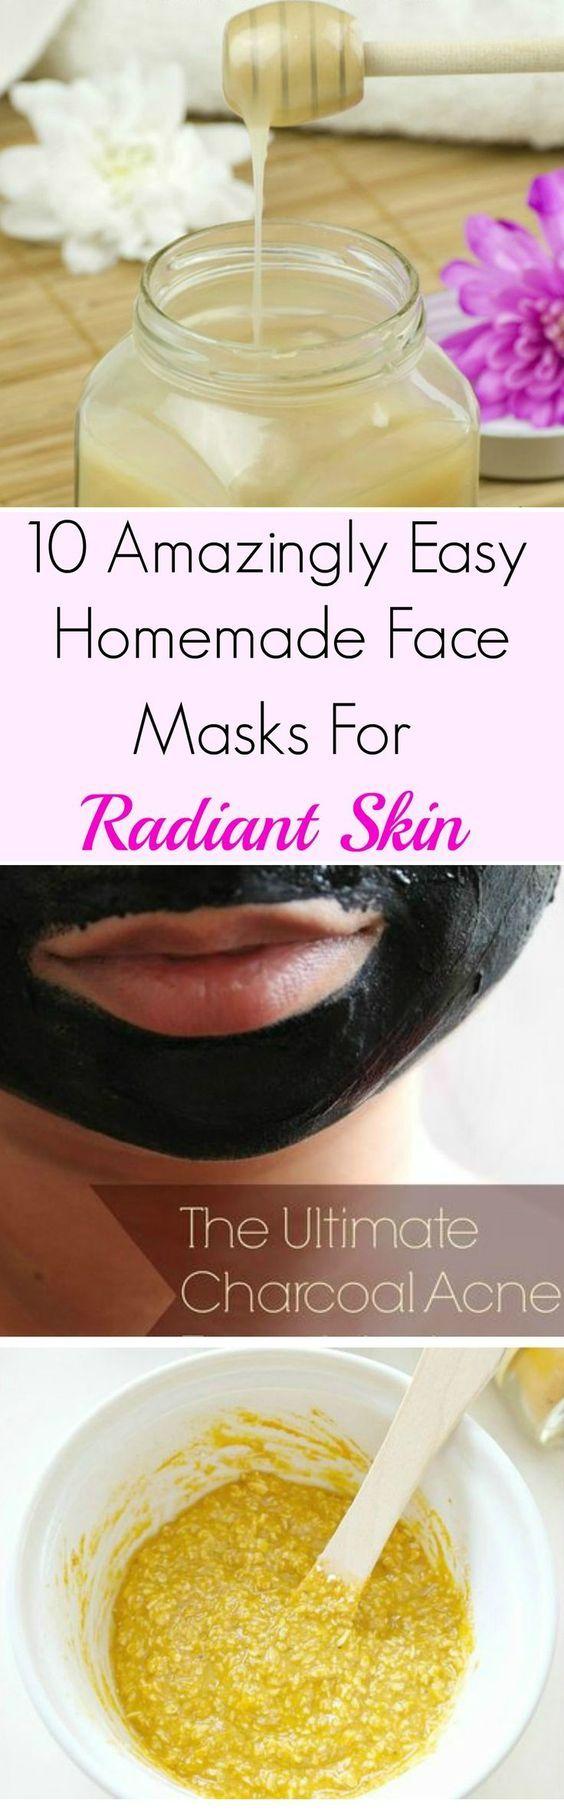 10 Amazingly Easy Homemade Face Masks For Radiant Skin. Wonderful list of DIY…